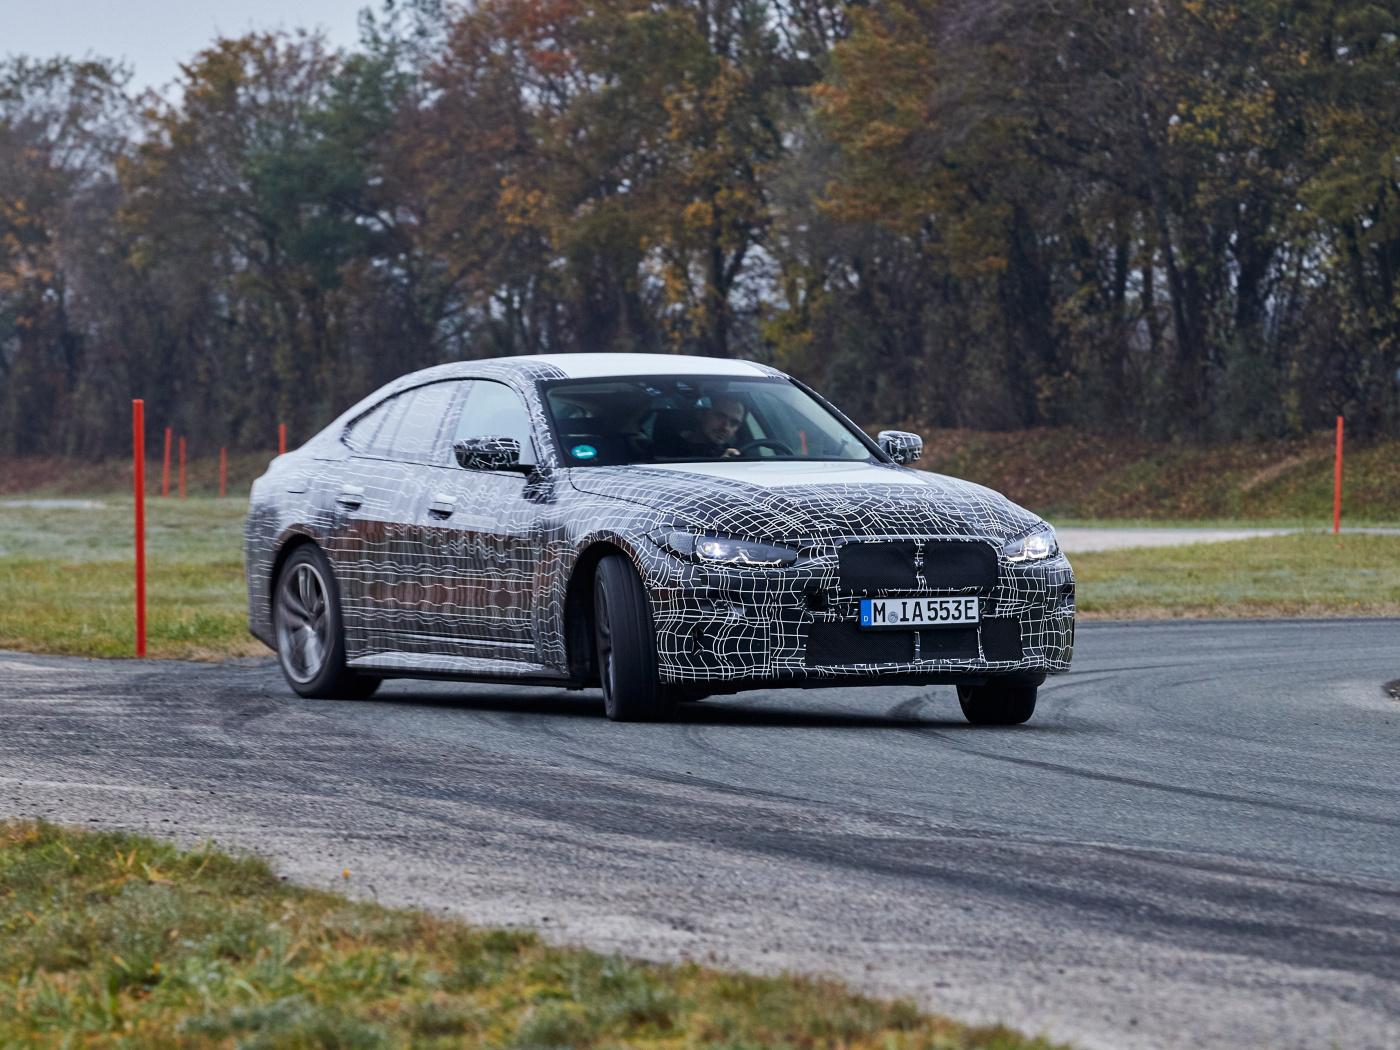 Elektrické BMW i4 dostane 530 koní a stovku zvládne za 4 sekundy